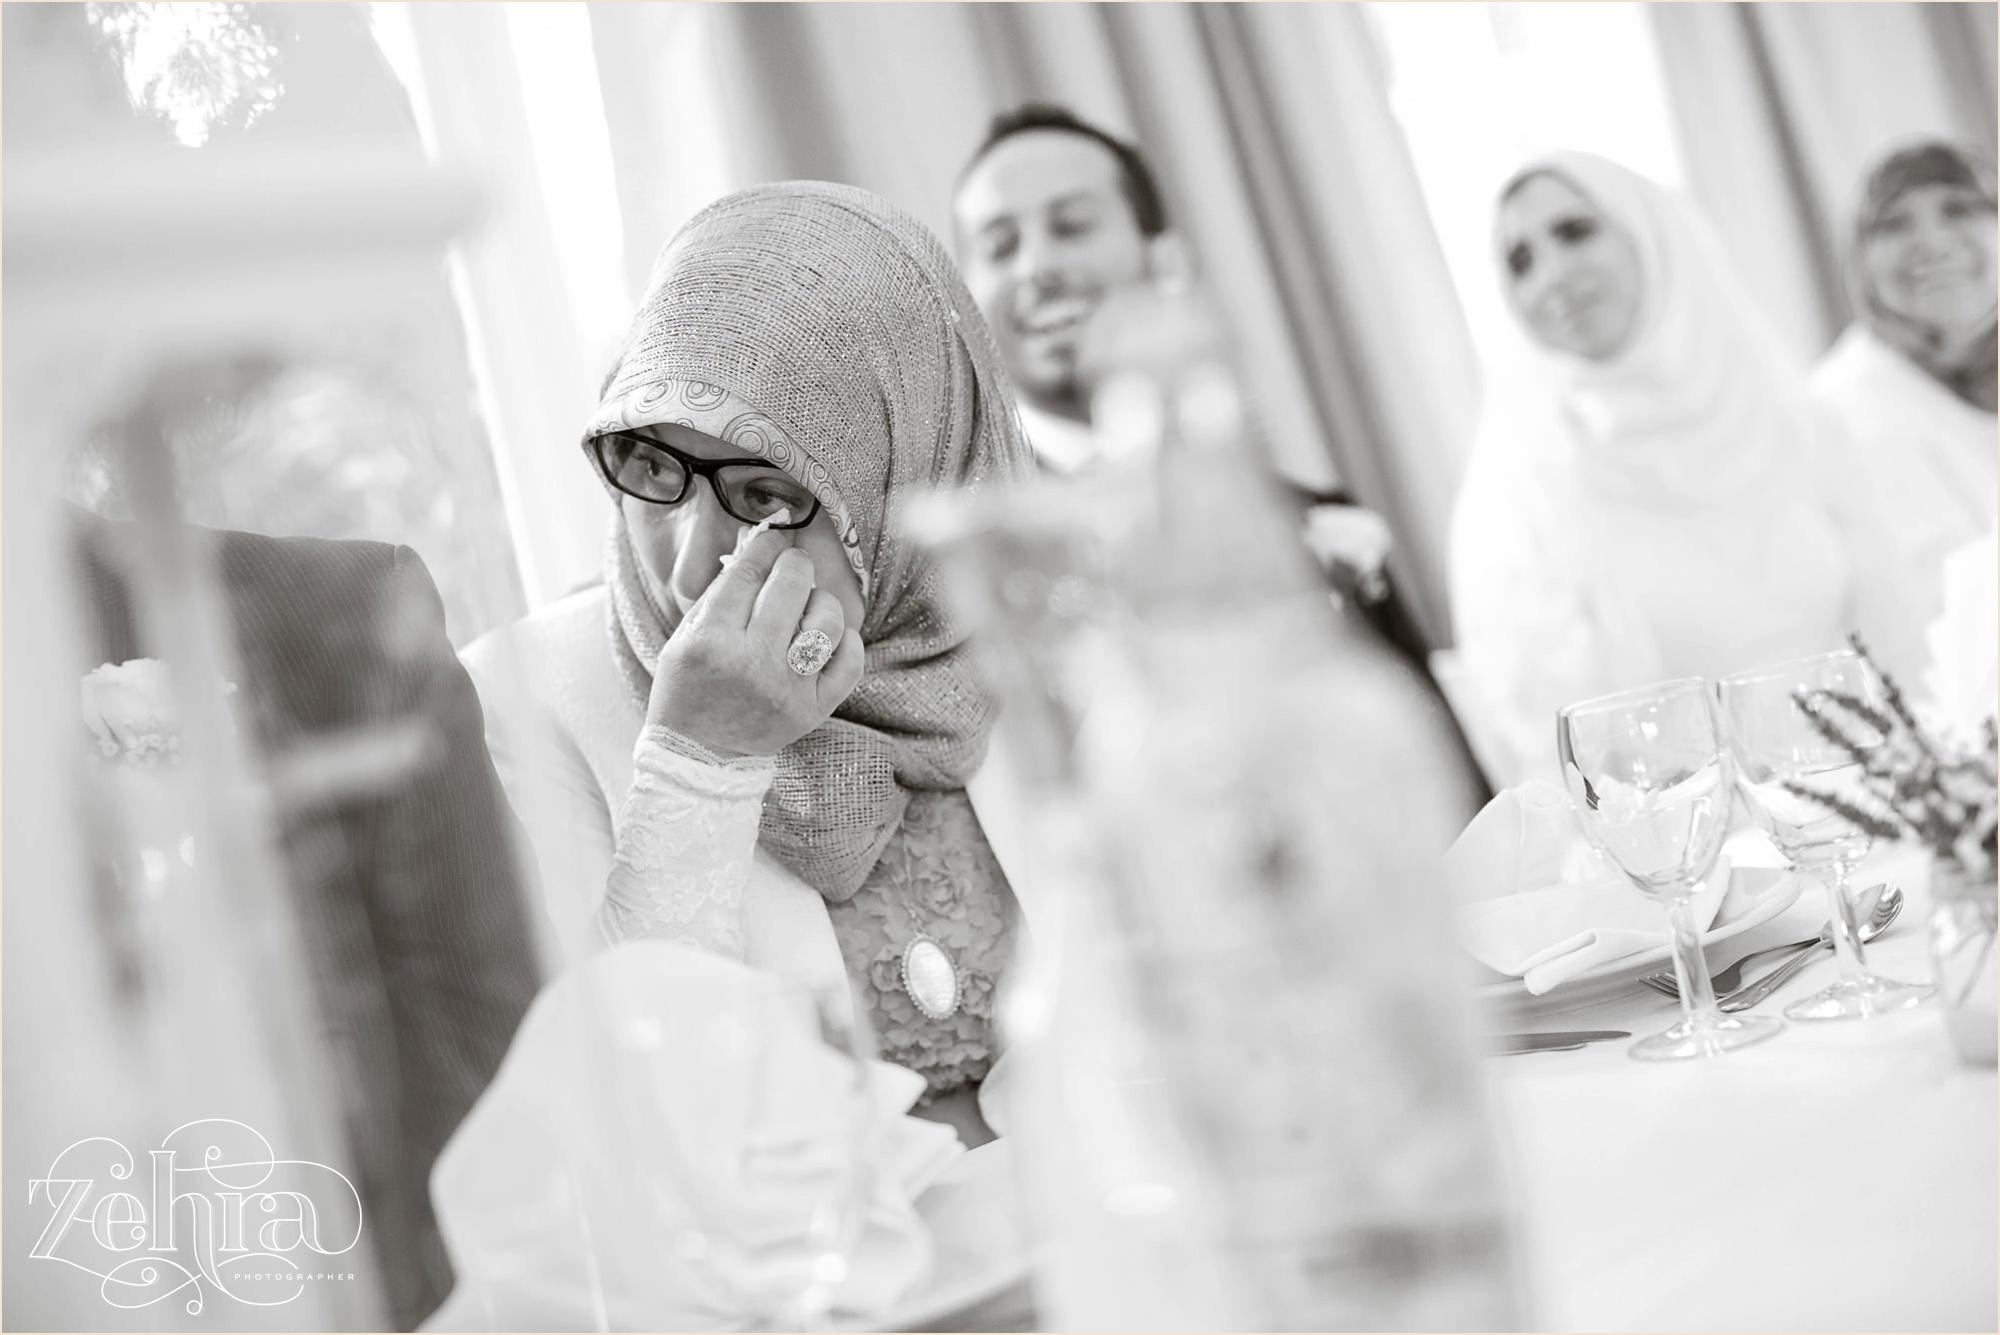 jasira manchester wedding photographer_0102.jpg